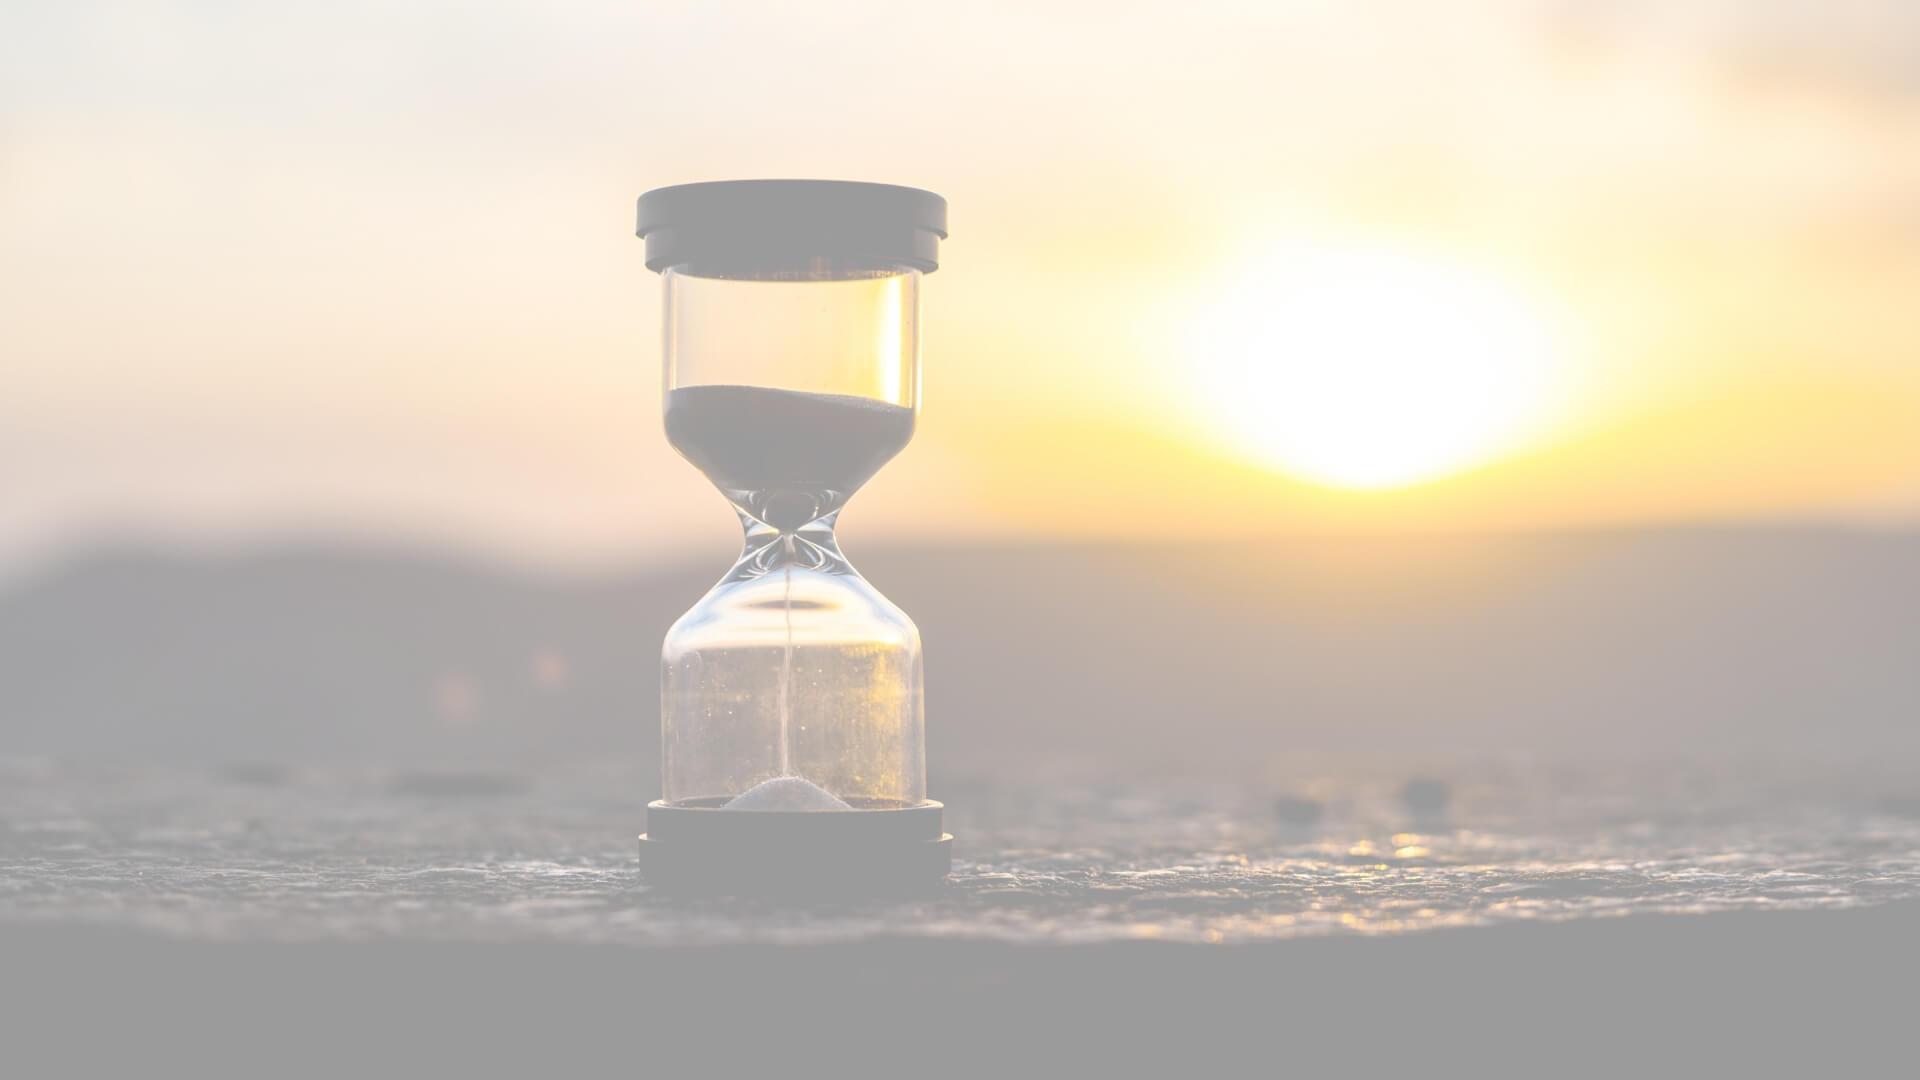 When It Is Good To Waste Time - Vishnu Goyal